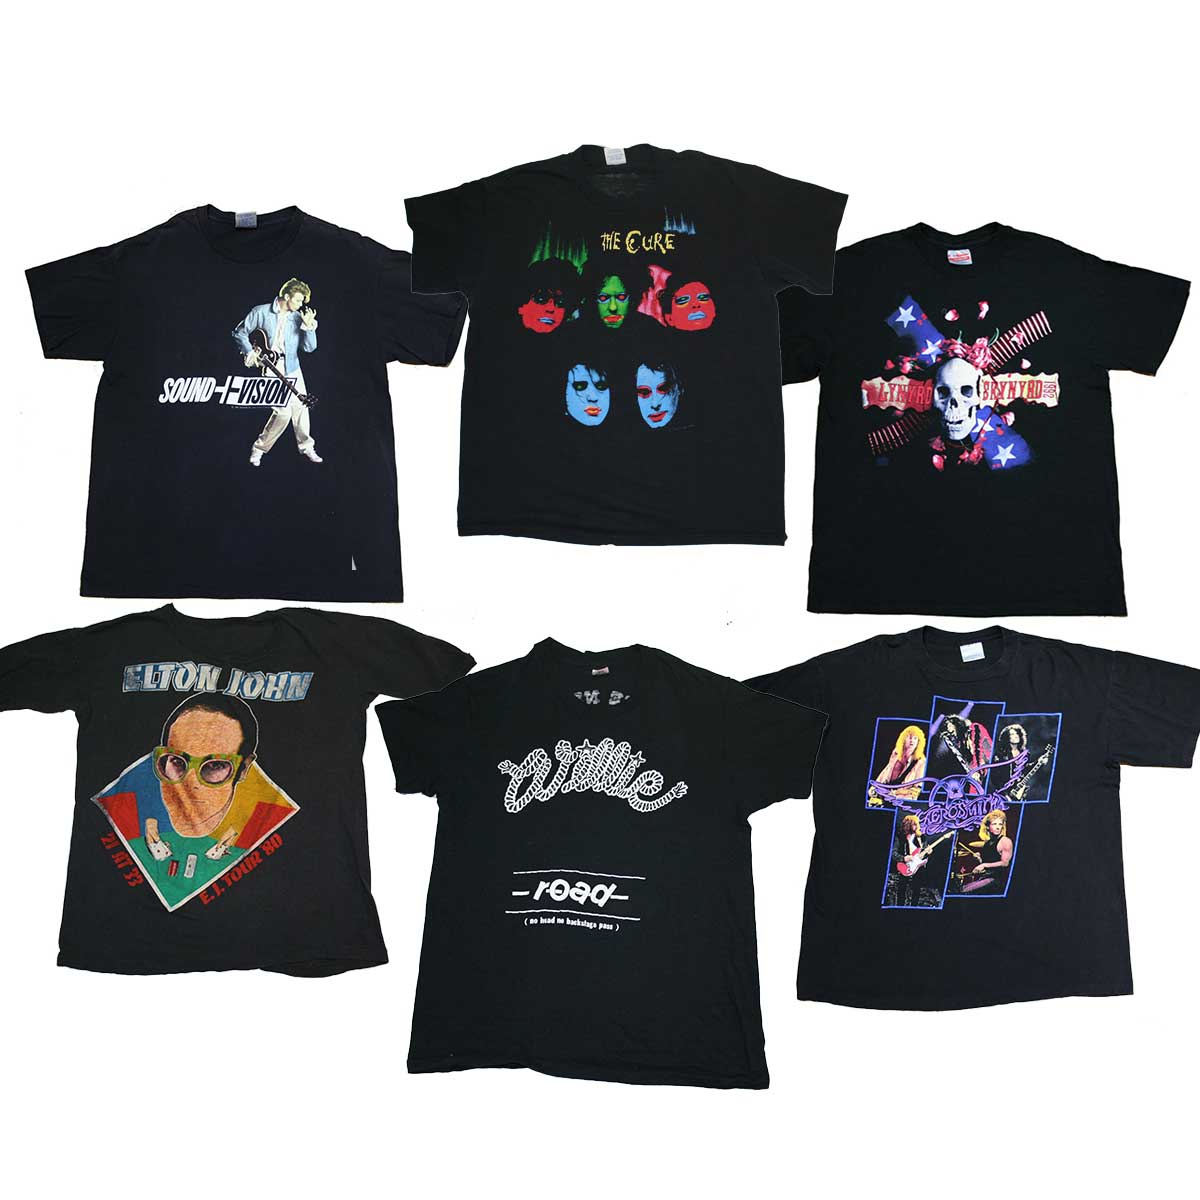 cae6746a Dust Factory Vintage Wholesale Catalog - Clothing, Denim, T-shirts ...